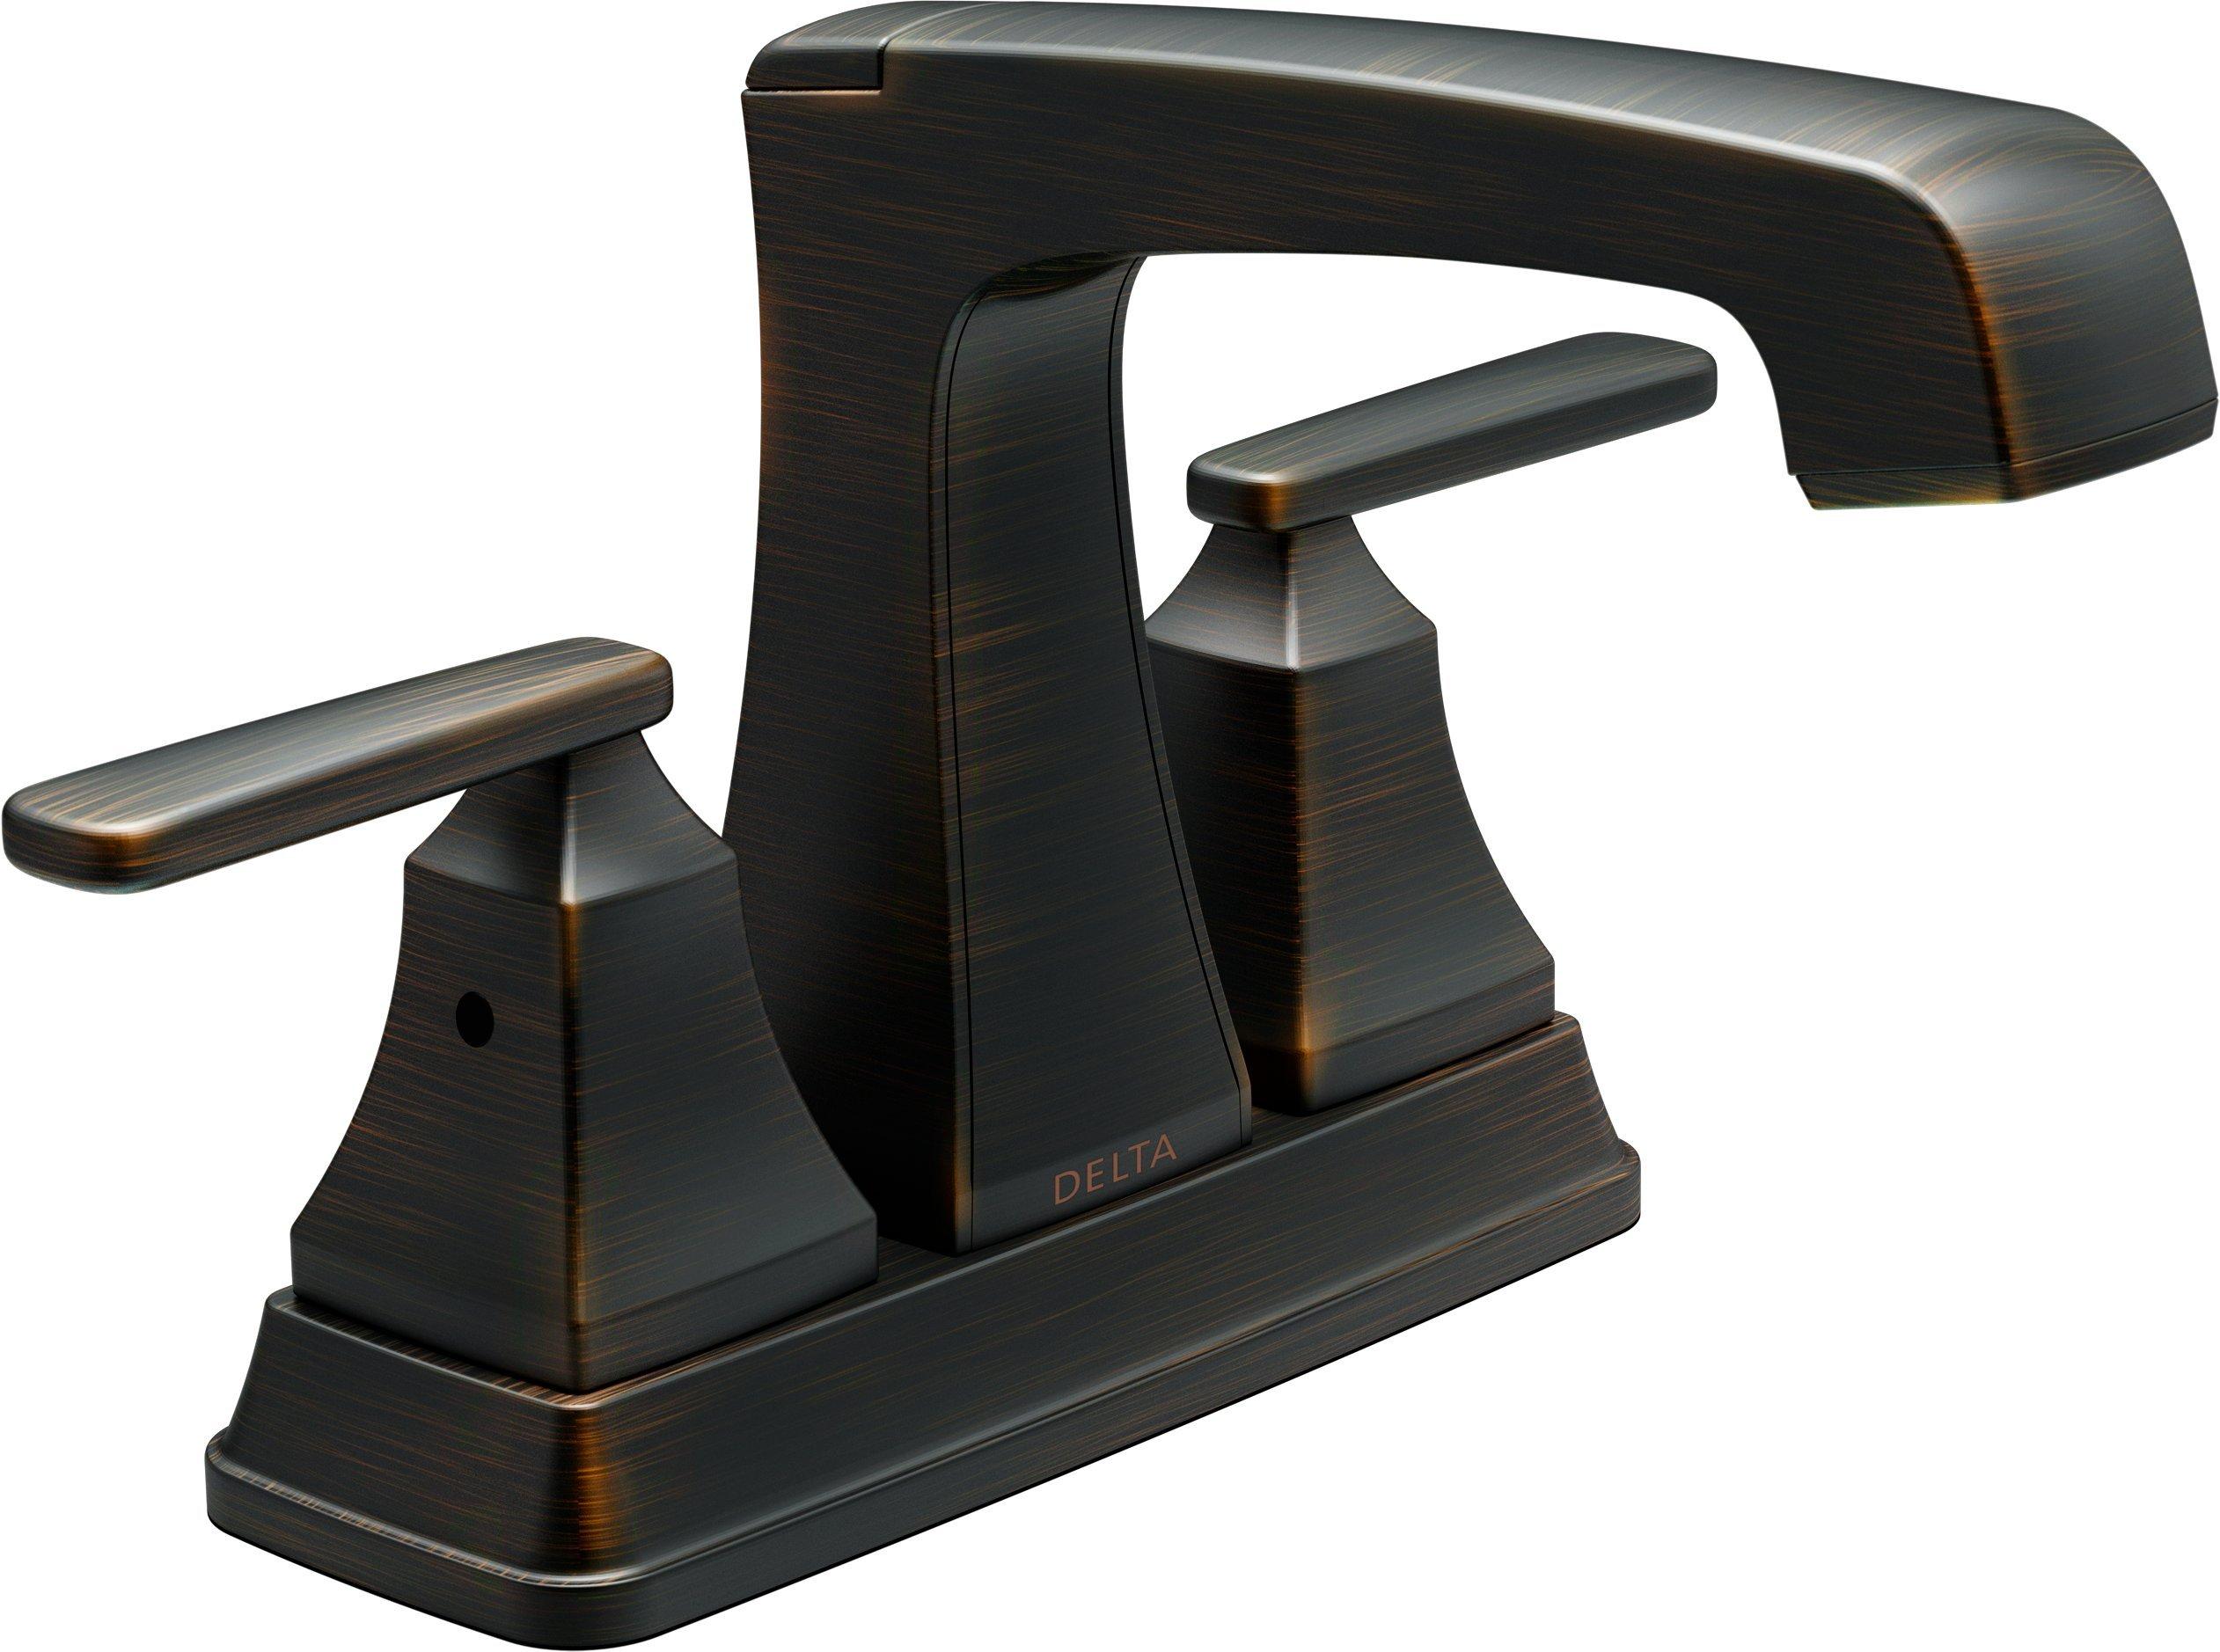 Delta Faucet 2564 RBMPU DST Ashlyn Two Handle Centerset Bathroom Faucet, Venetian Bronze